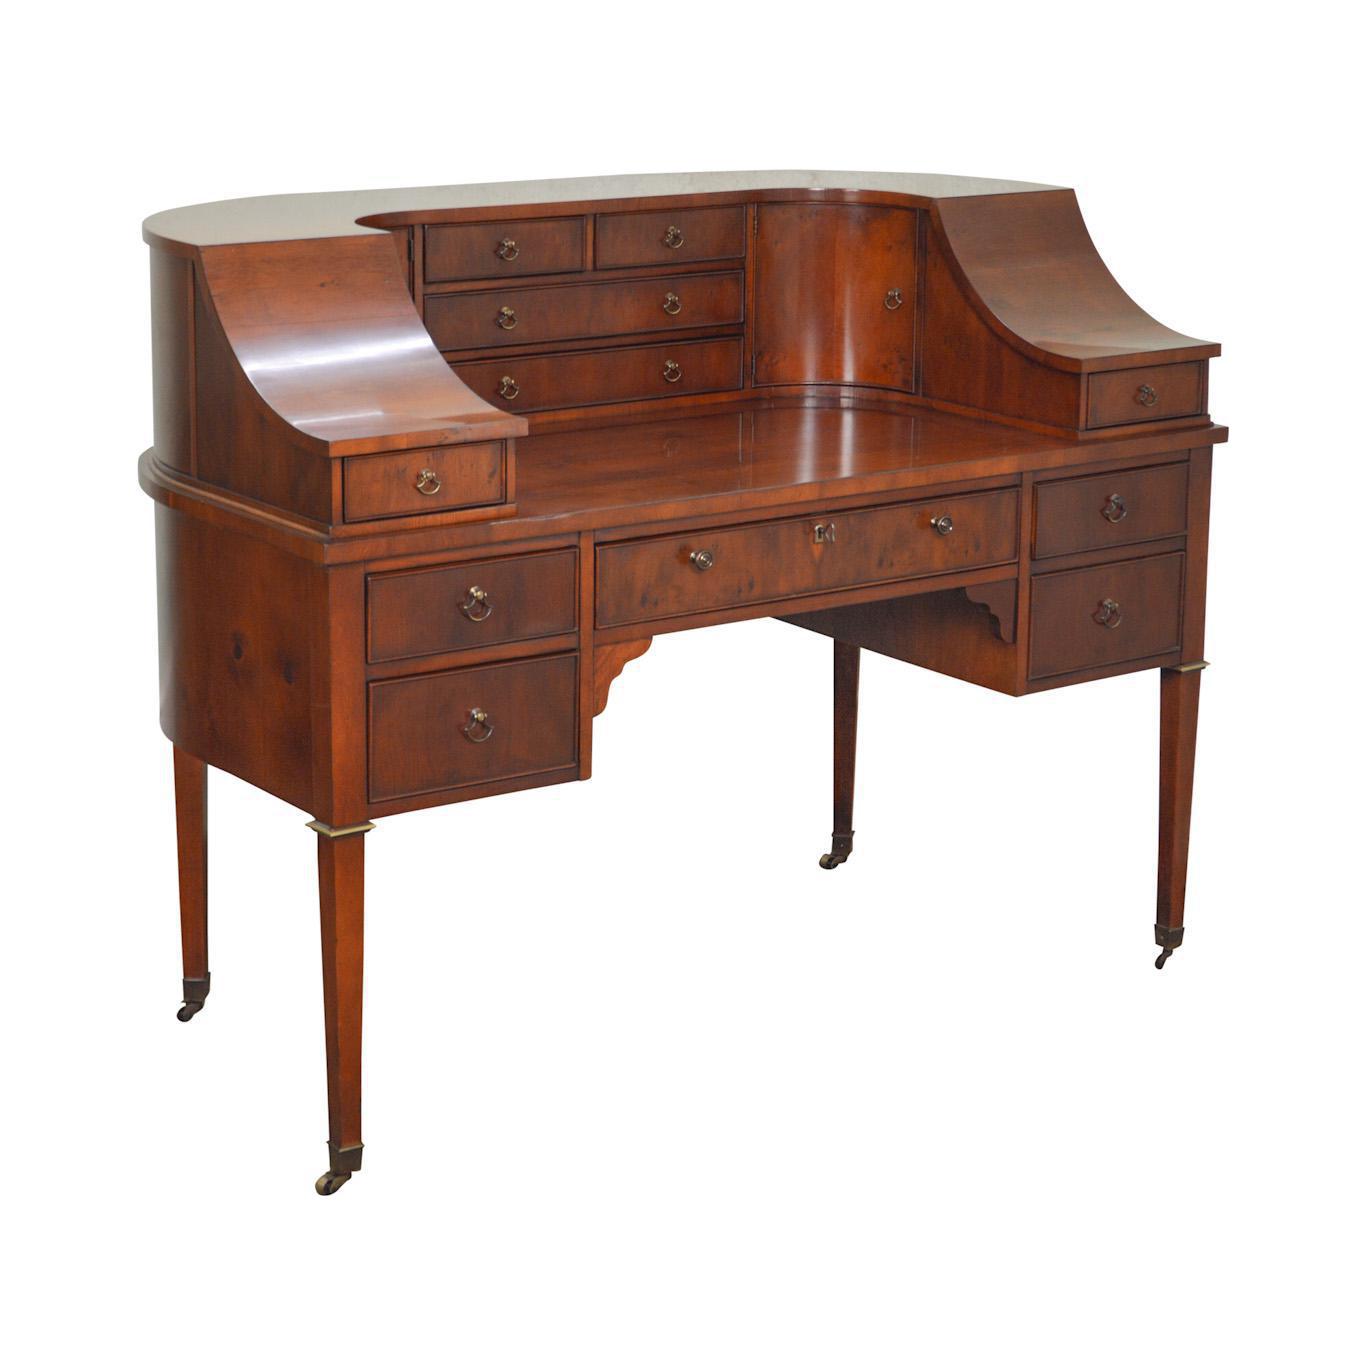 Hekman Quality Yew Wood Carlton House Desk